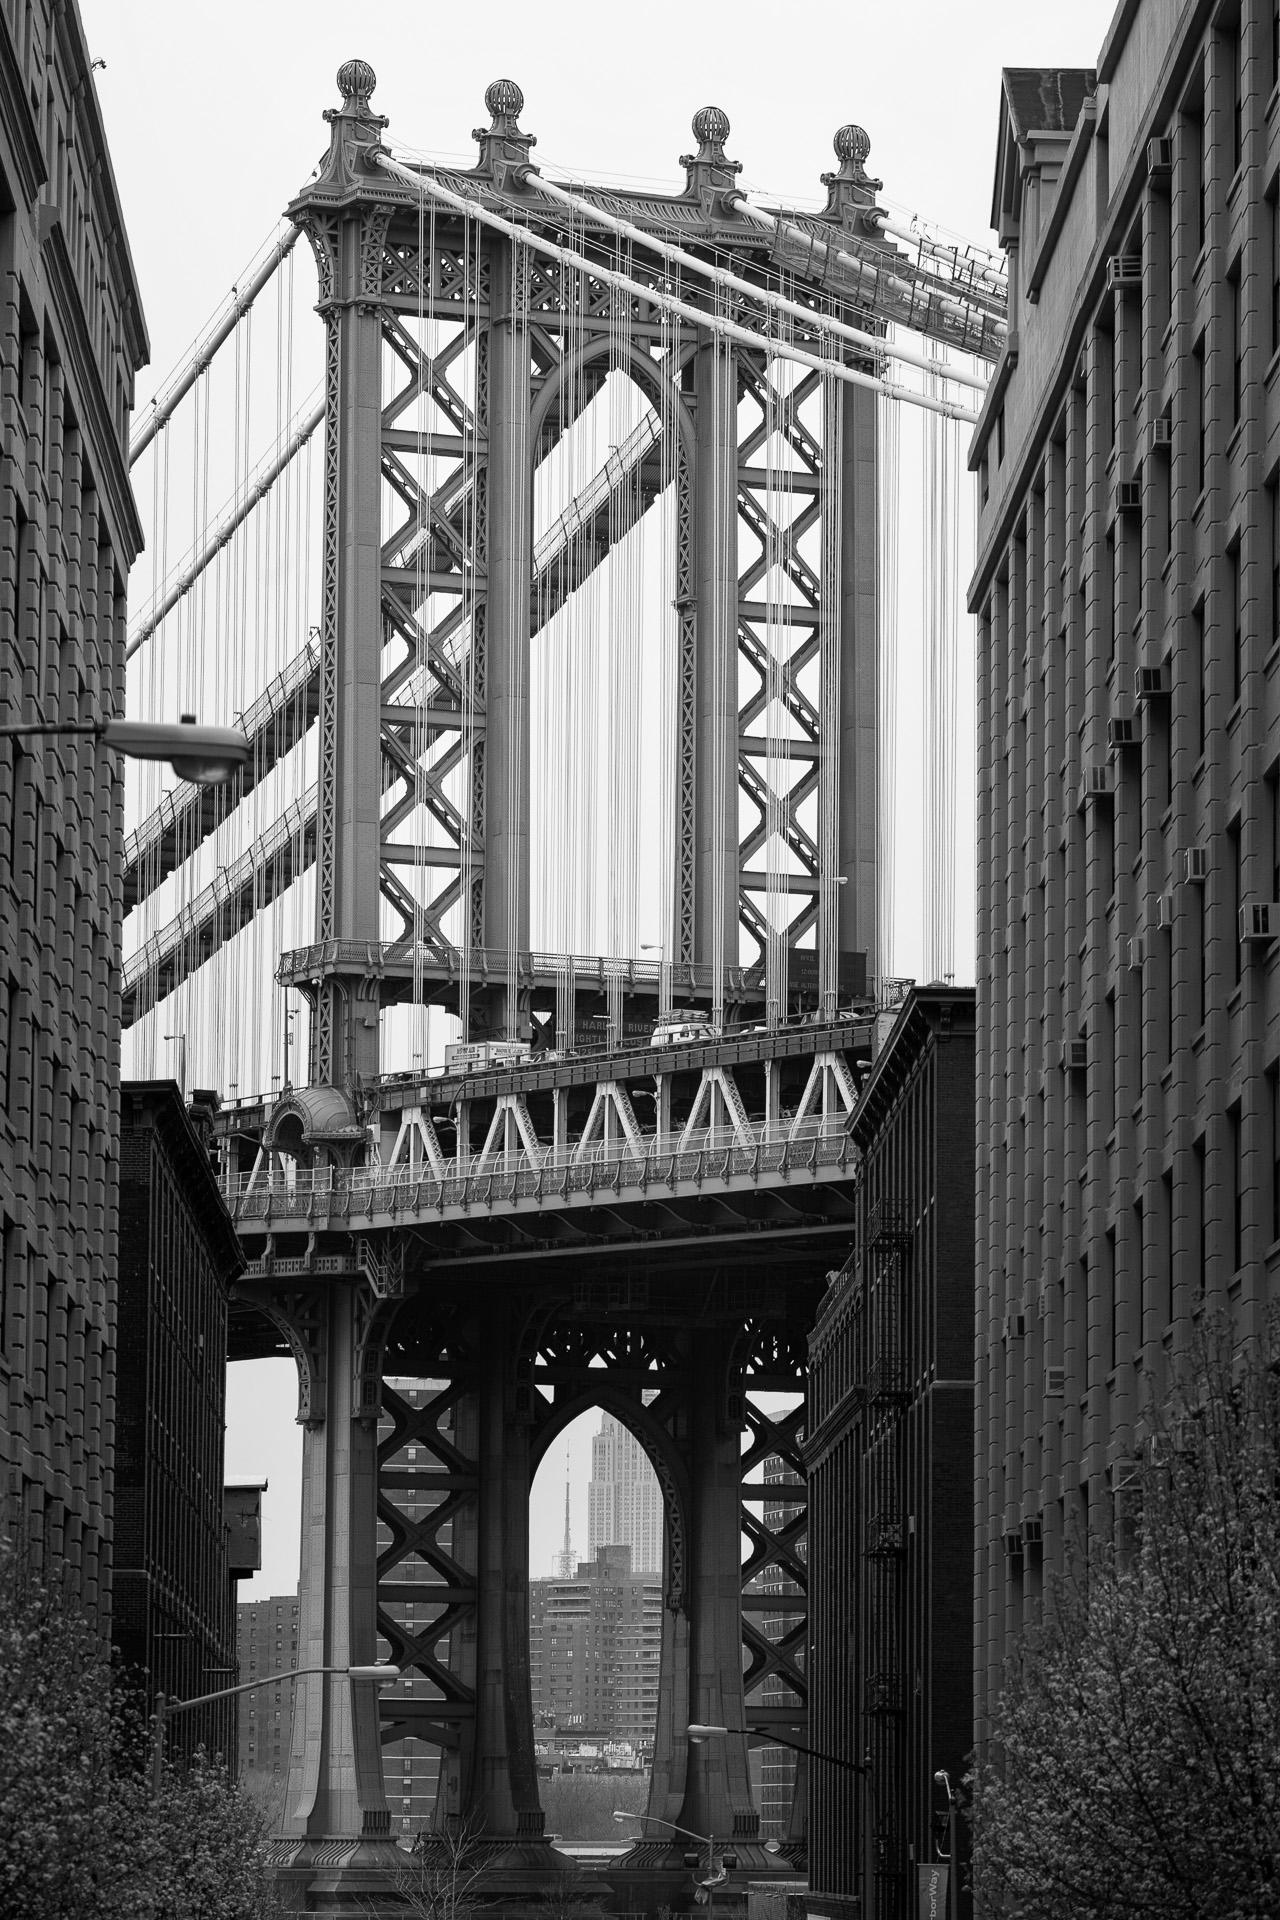 _nf-newyork-manhattanbridge fotografie in bianco e nero